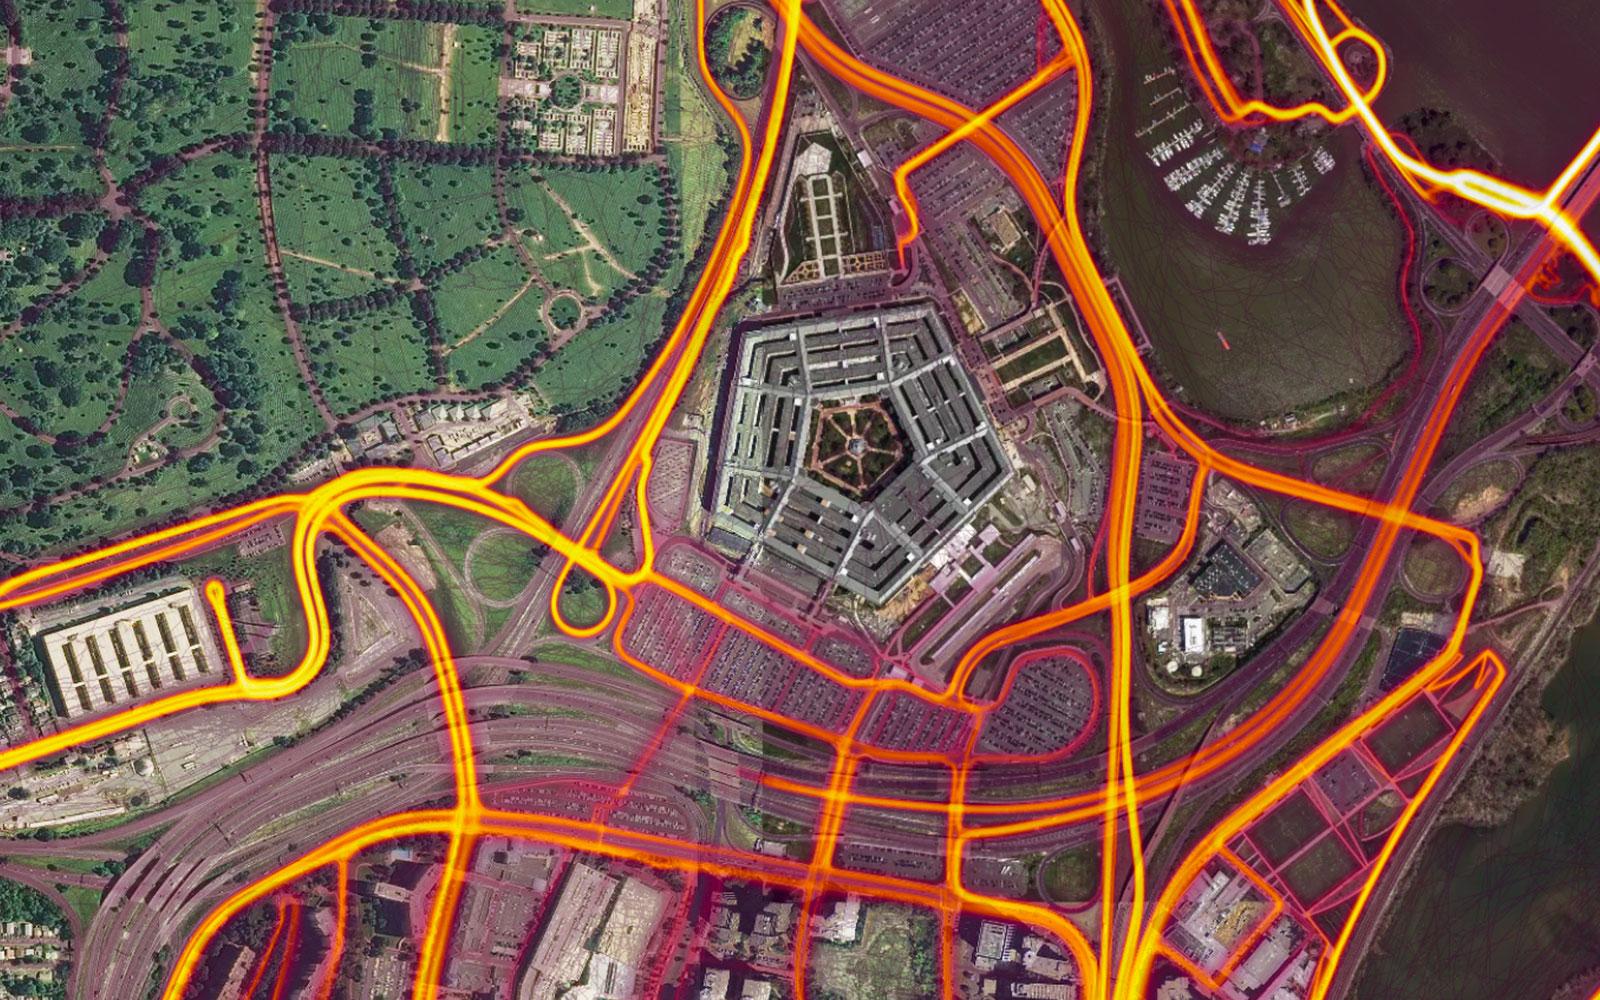 Strava Heat Maps Strava's fitness heatmaps are a 'potential catastrophe'